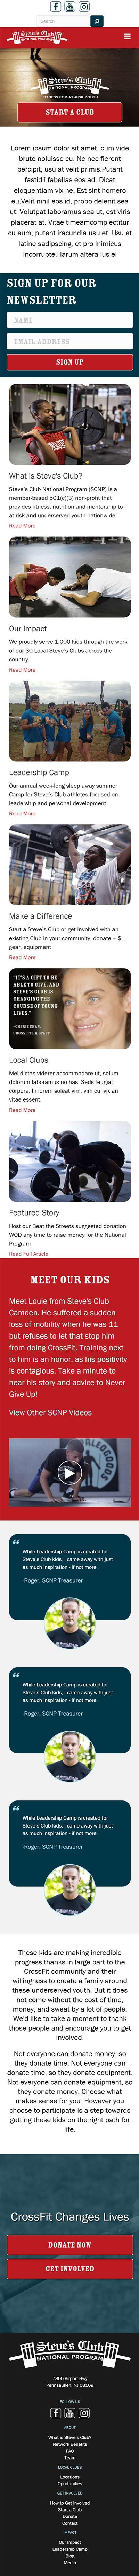 Steve's Club Mobile Website Scroll